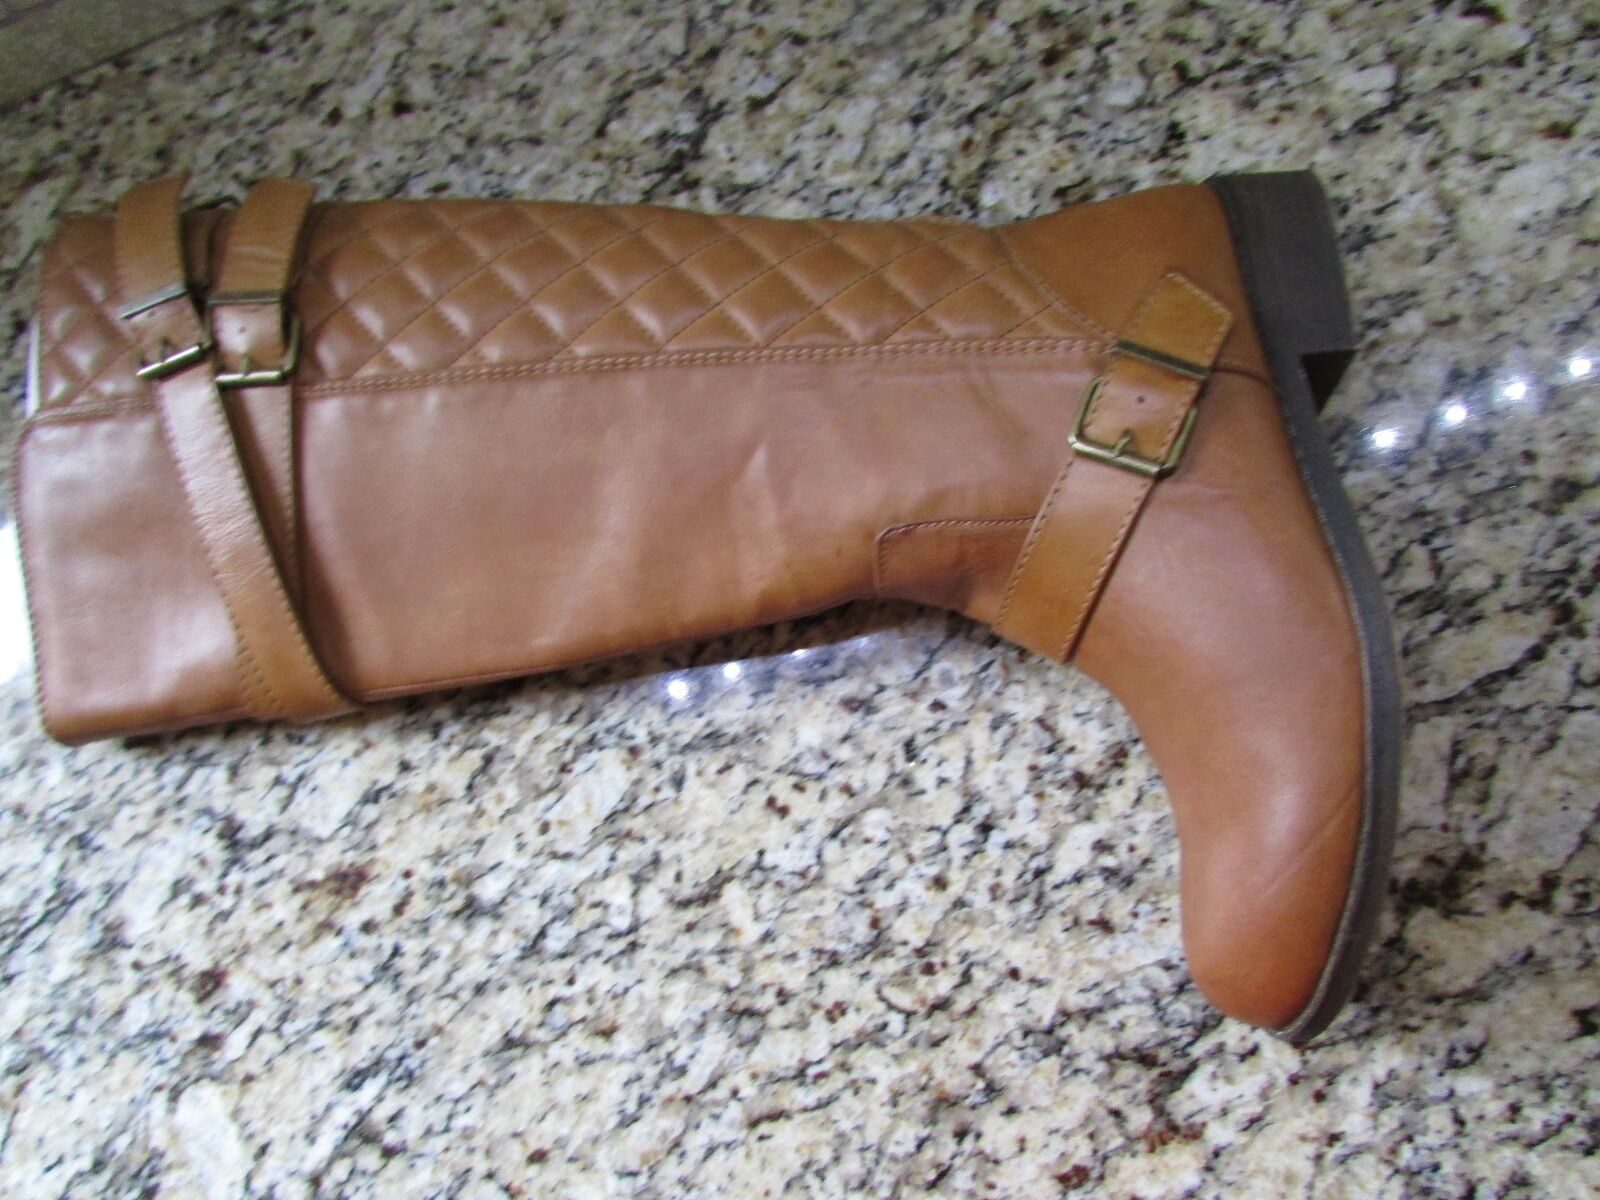 Nouveau Steve Madden Madden Girl Calinda Cognac Haute bottes d'équitation pour femme 10 Tall